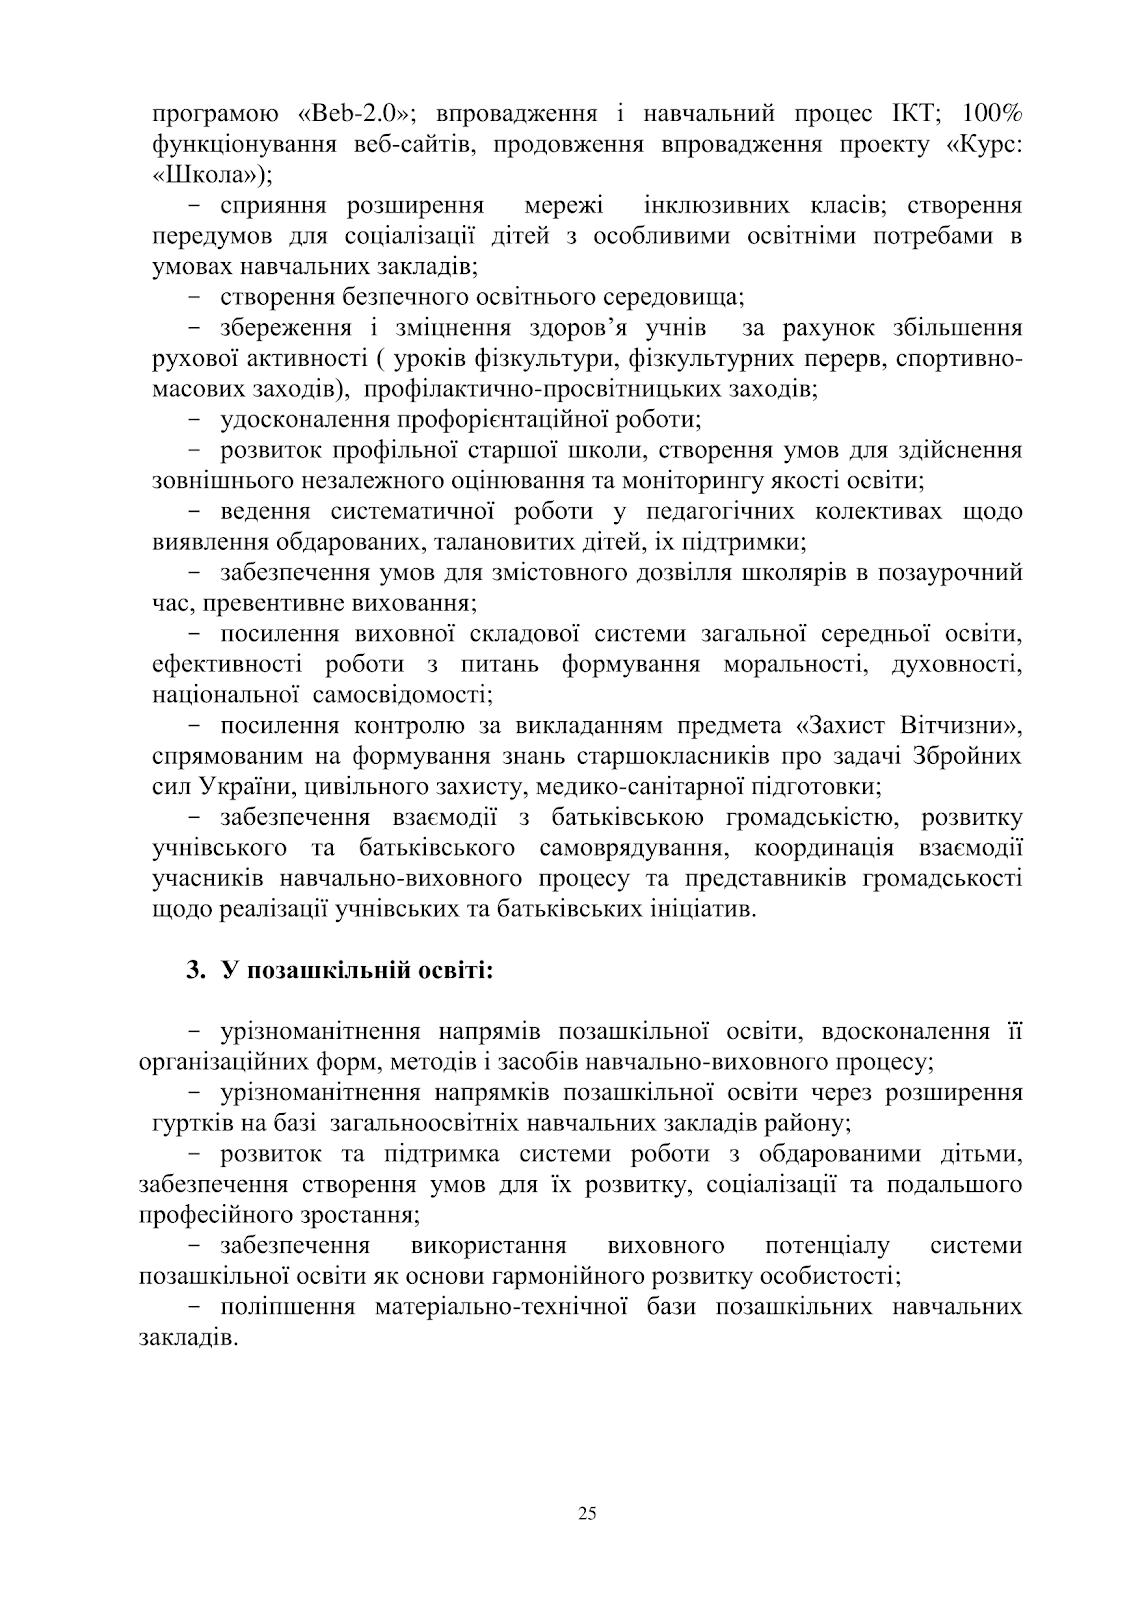 C:\Users\Валерия\Desktop\план 2016 рік\план 2016 рік-025.png